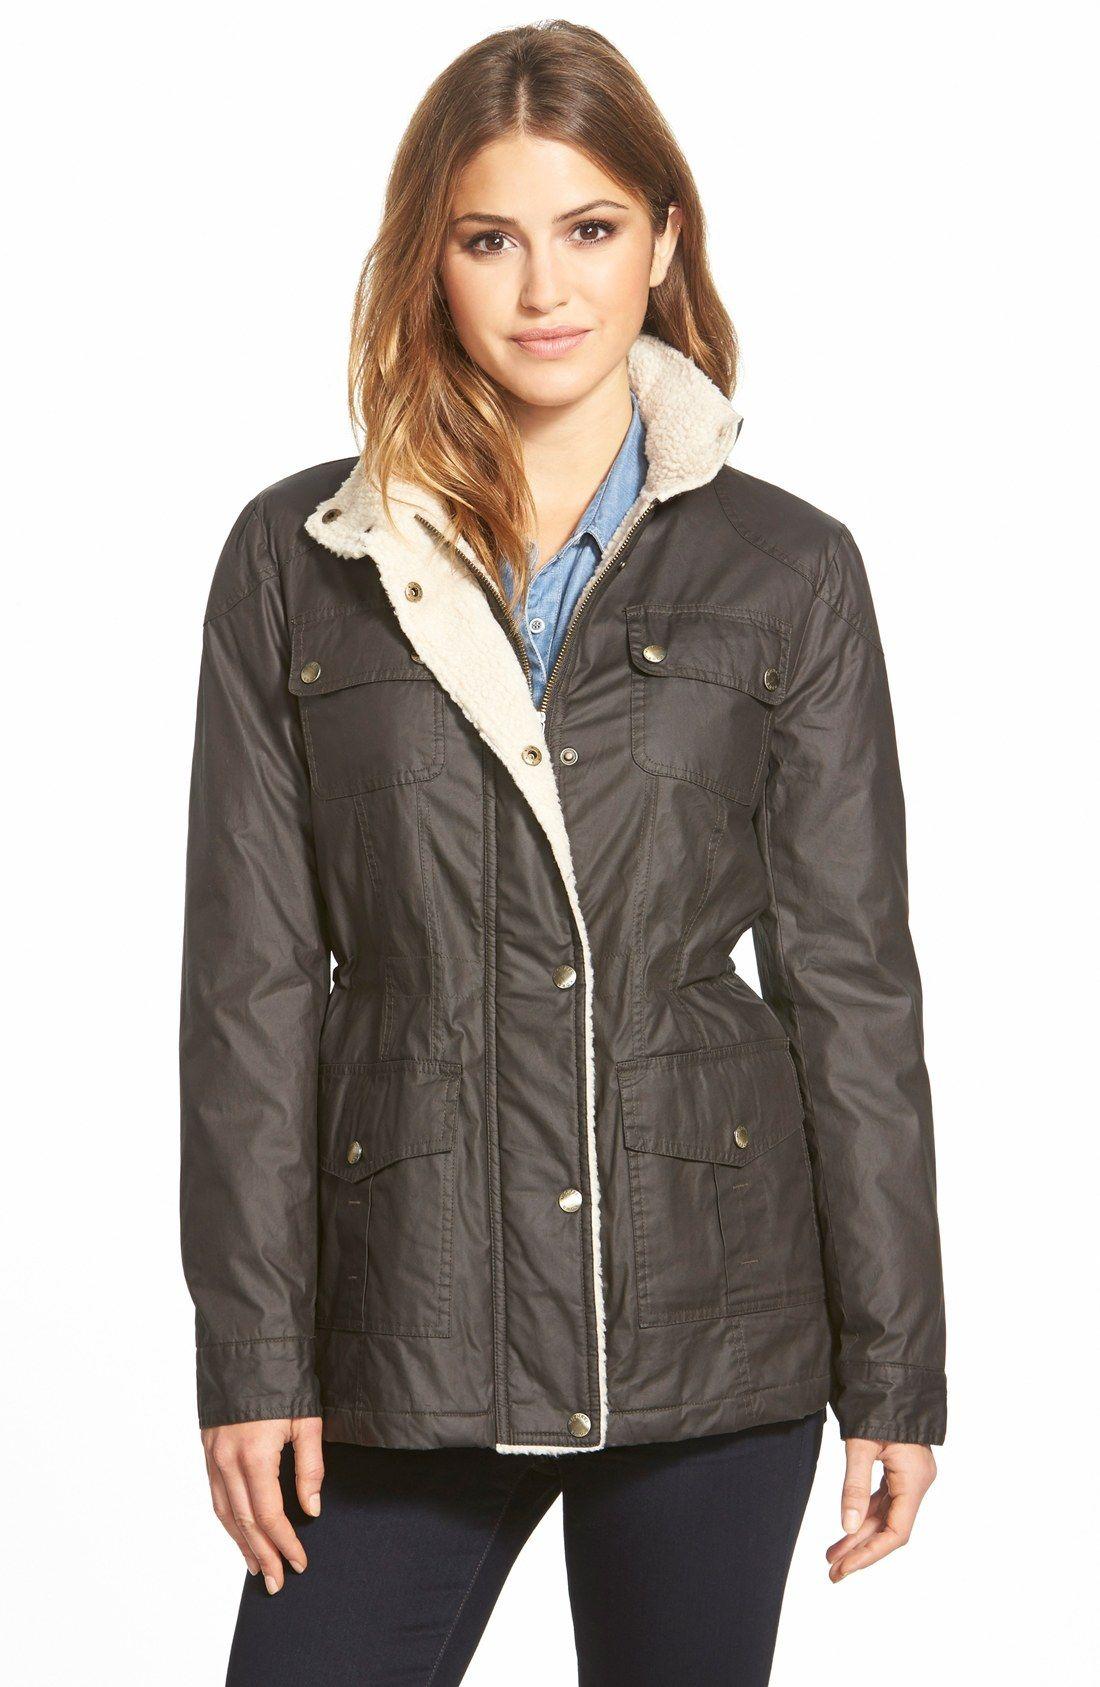 Michael Michael Kors Faux Shearling Trim Waxed Cotton Jacket Regular Petite Nordstrom Waxed Cotton Jacket Women Outerwear Jacket Jackets [ 1687 x 1100 Pixel ]